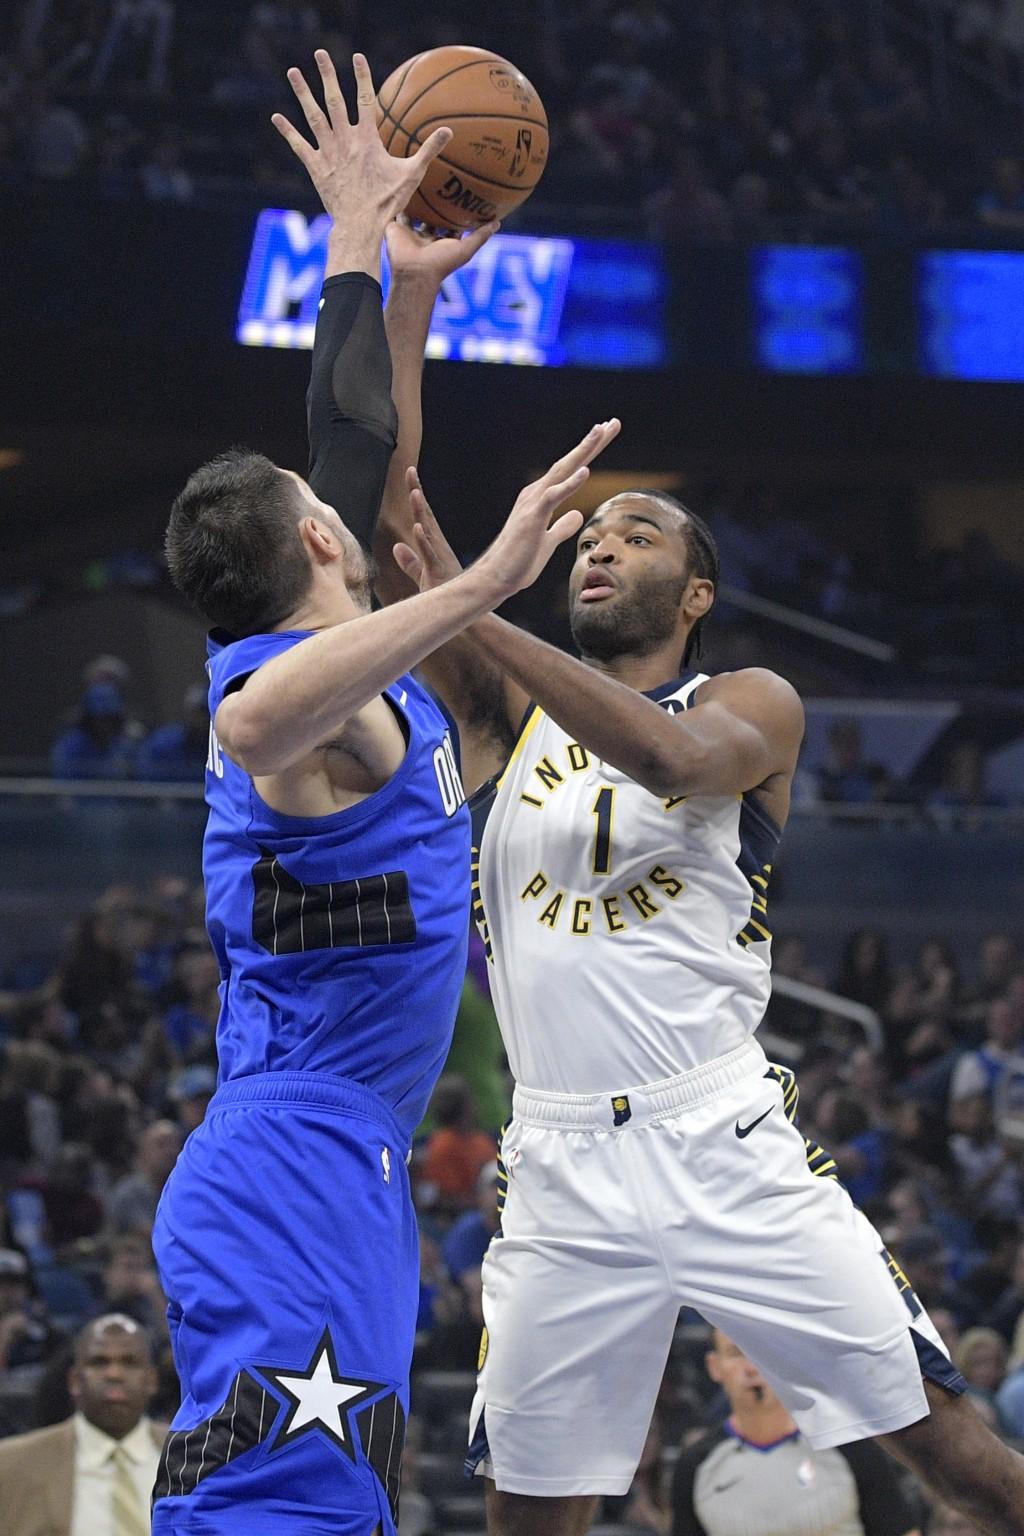 Indiana Pacers forward T.J. Warren (1) shoots over Orlando Magic center Nikola Vucevic during the first half of an NBA basketball game Sunday, Nov. 10...